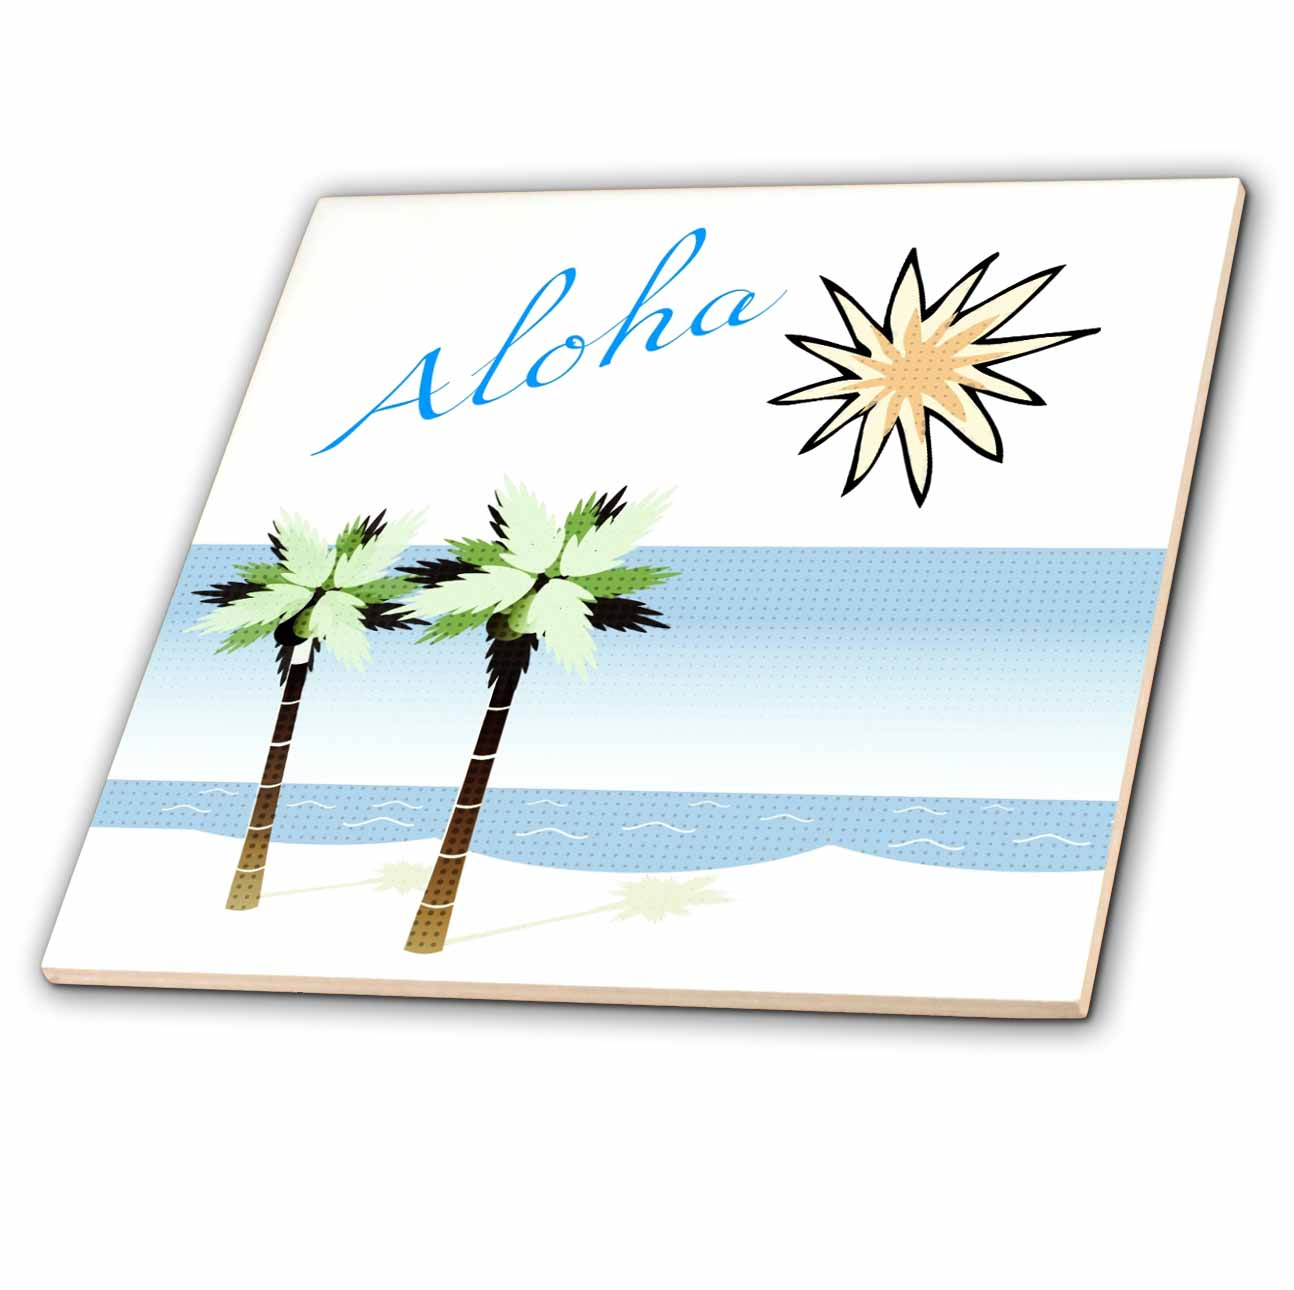 3dRose Aloha Hawaiian Beach Art - Travel - Ocean and Palm Trees - Ceramic Tile, 4-inch